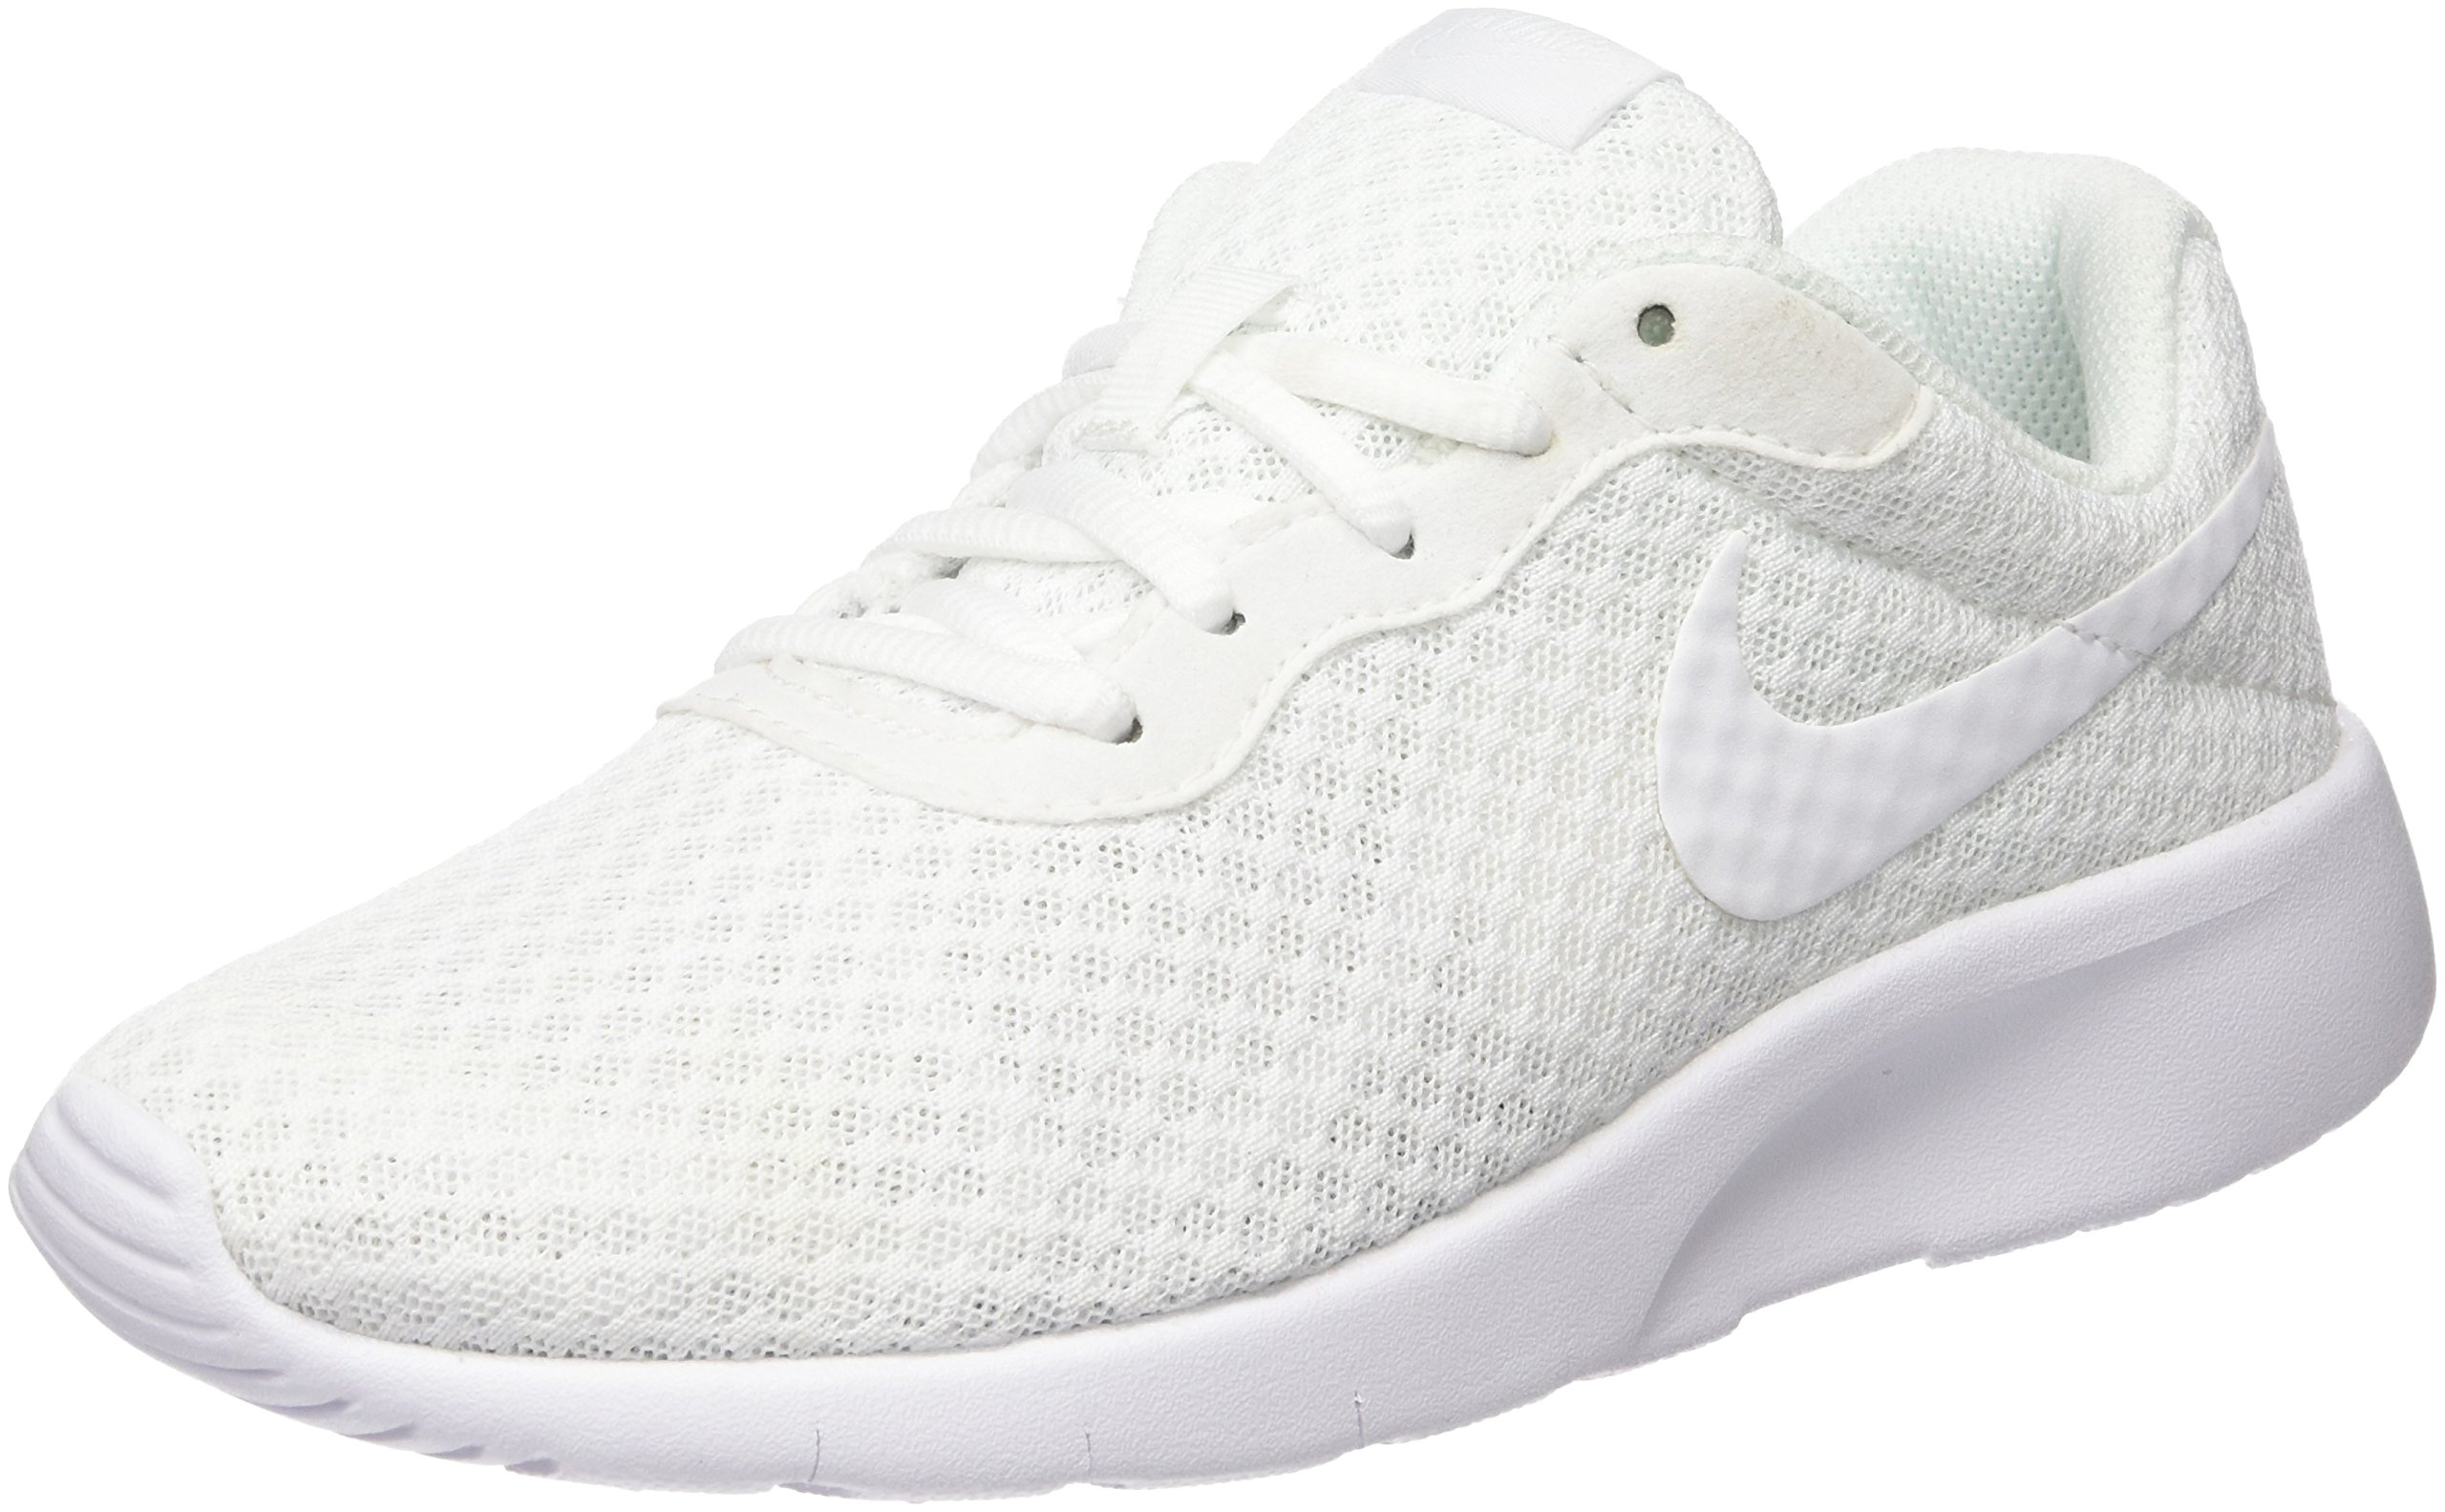 ... promo code for nike kids tanjun gs white white white running shoe 4.5  kids us 9f3b4 7186e06072b1c